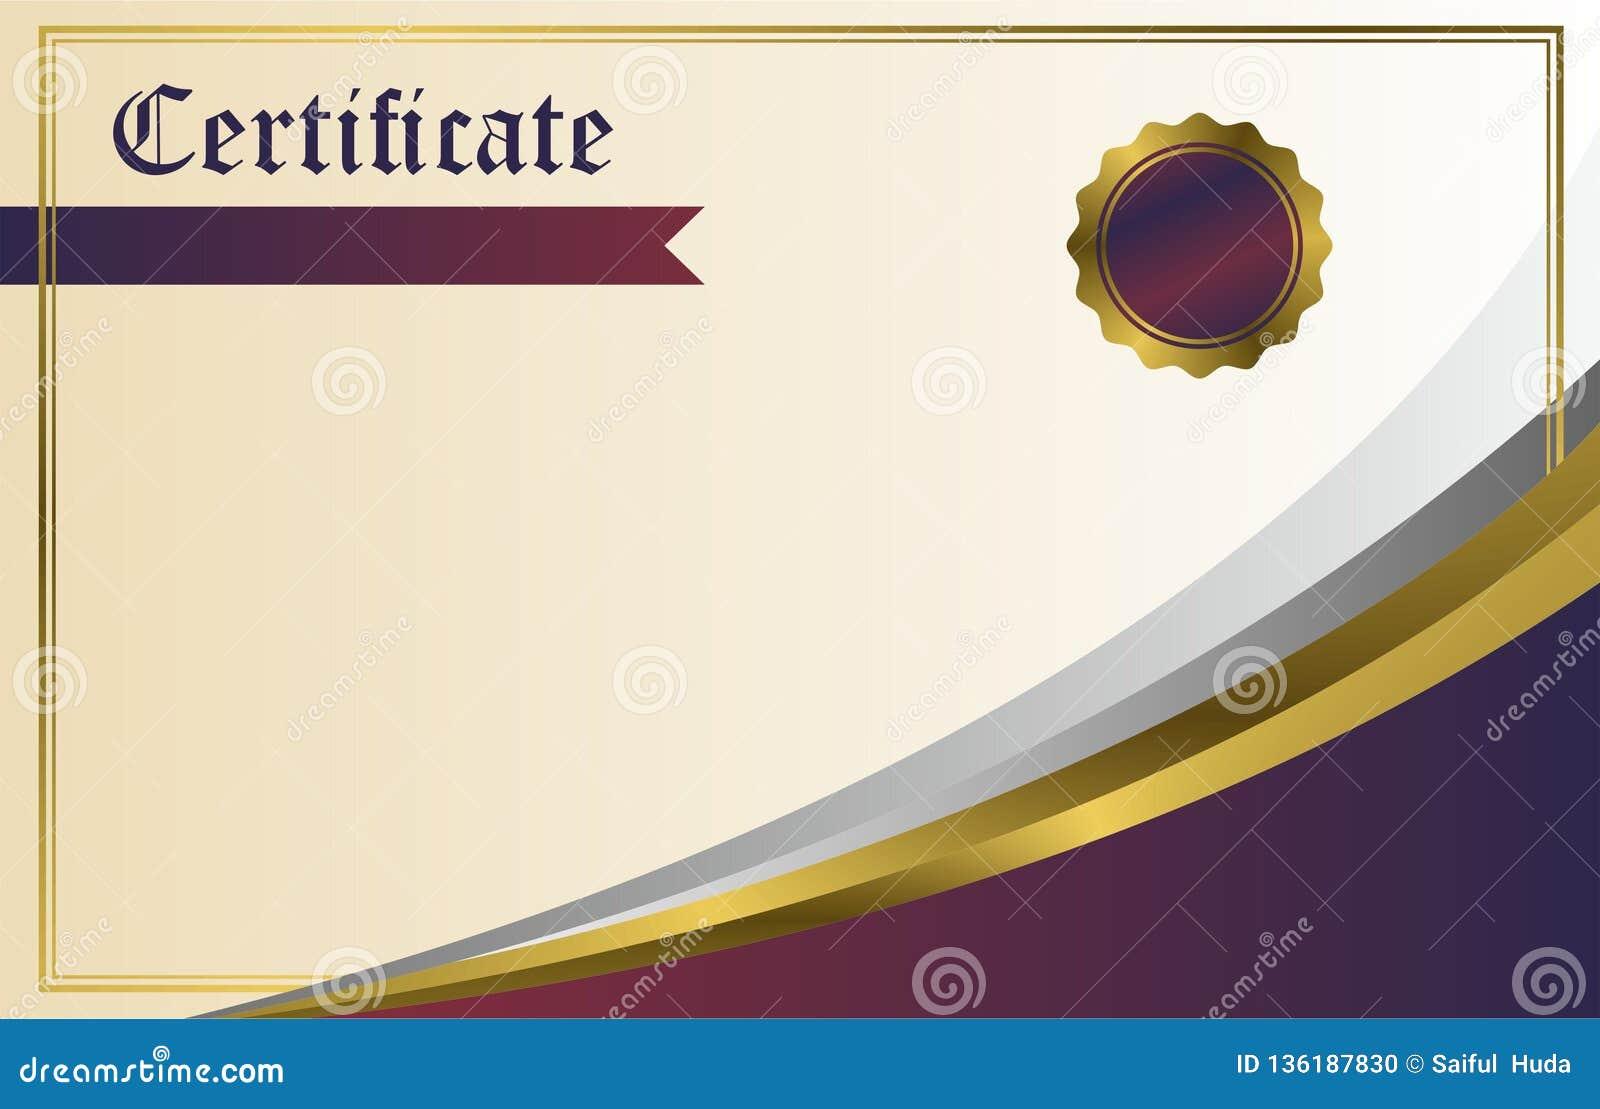 certificate background design vector purple gold stock